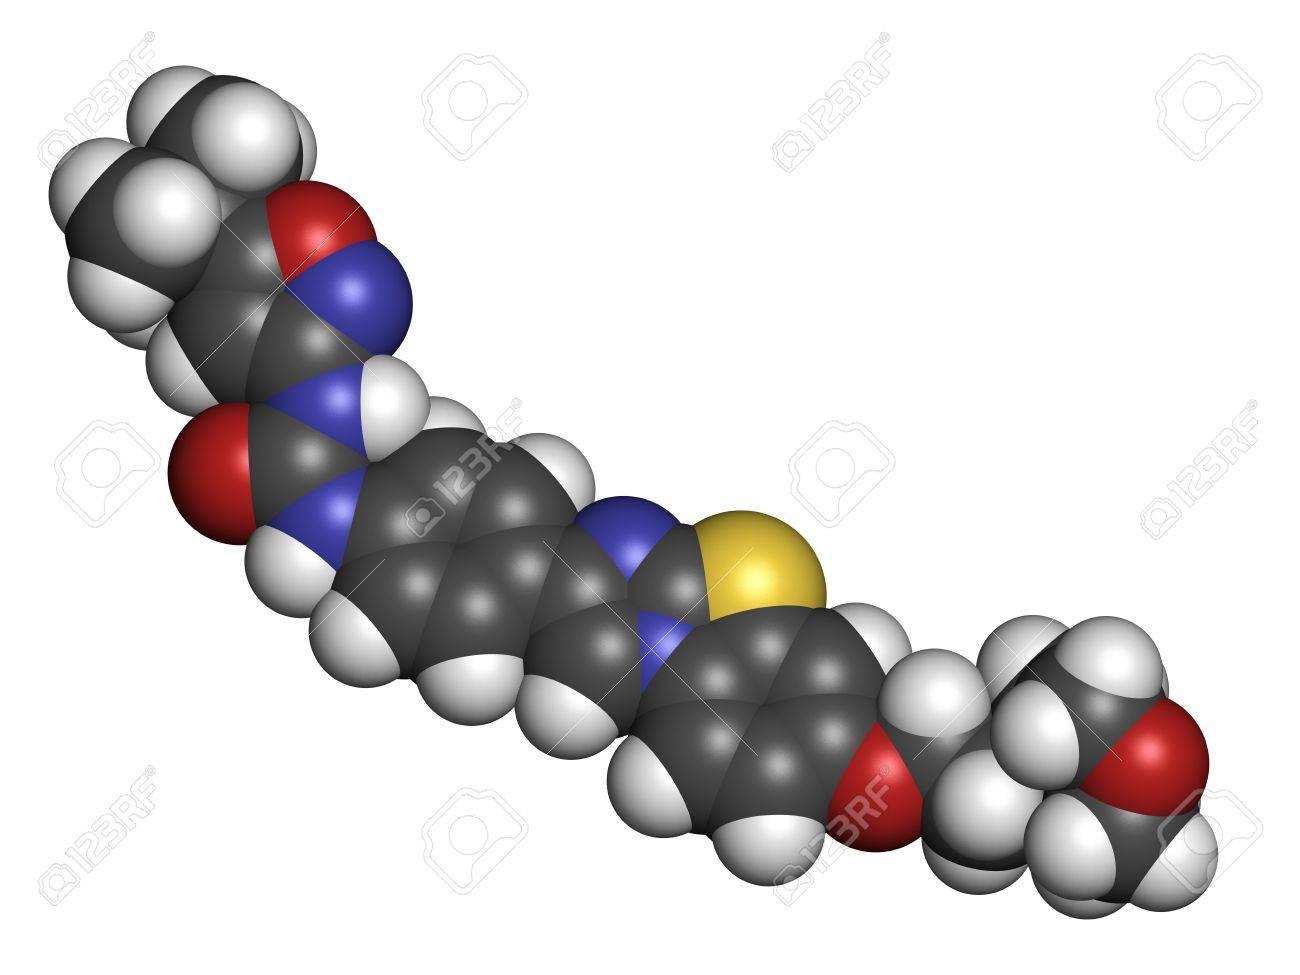 Quizartinib investigational acute myeloid leukemia (AML) drug,